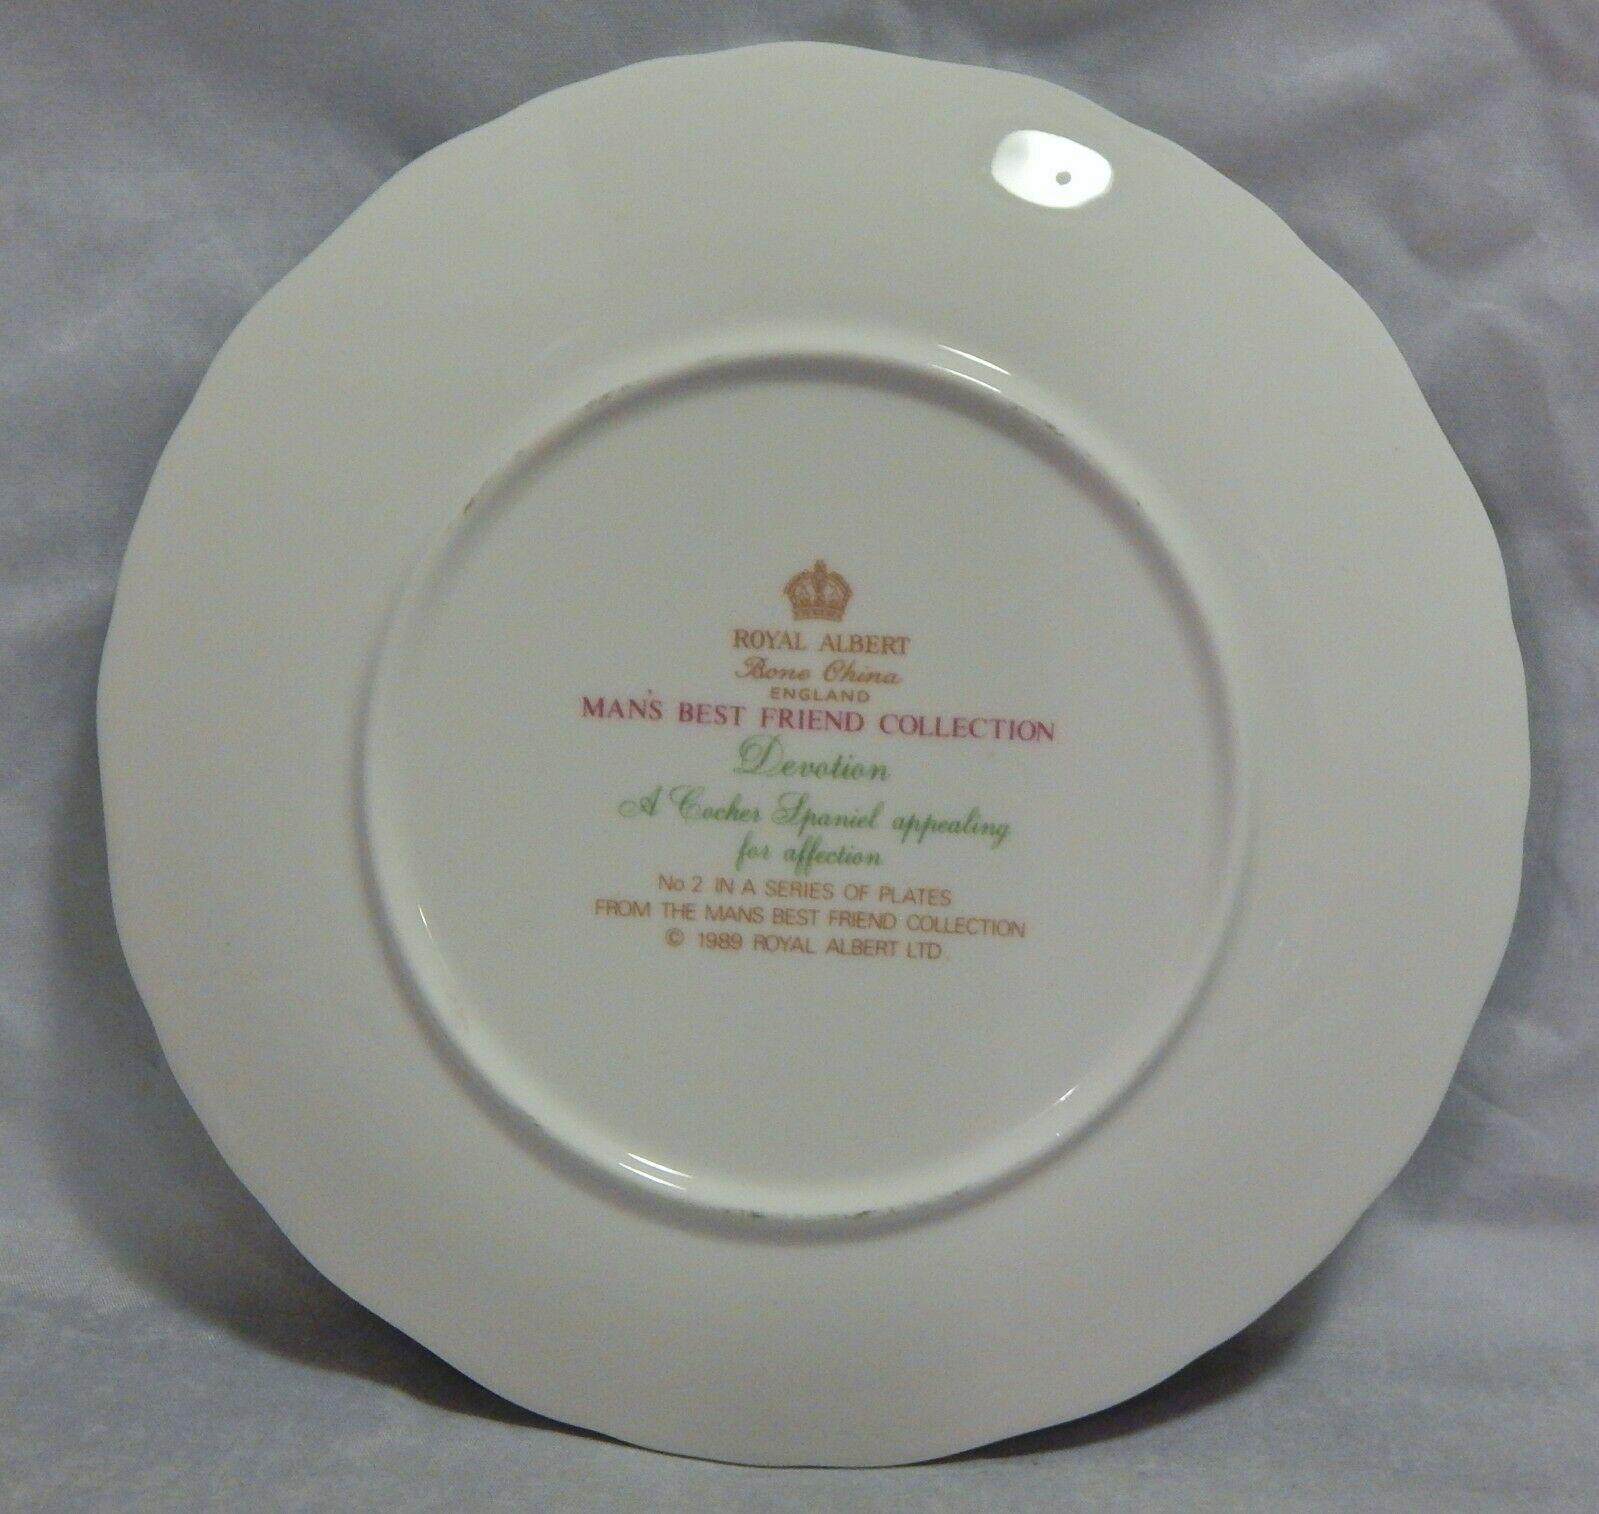 Royal Albert Man's Best Friend Collection Cocker Spaniel Plate